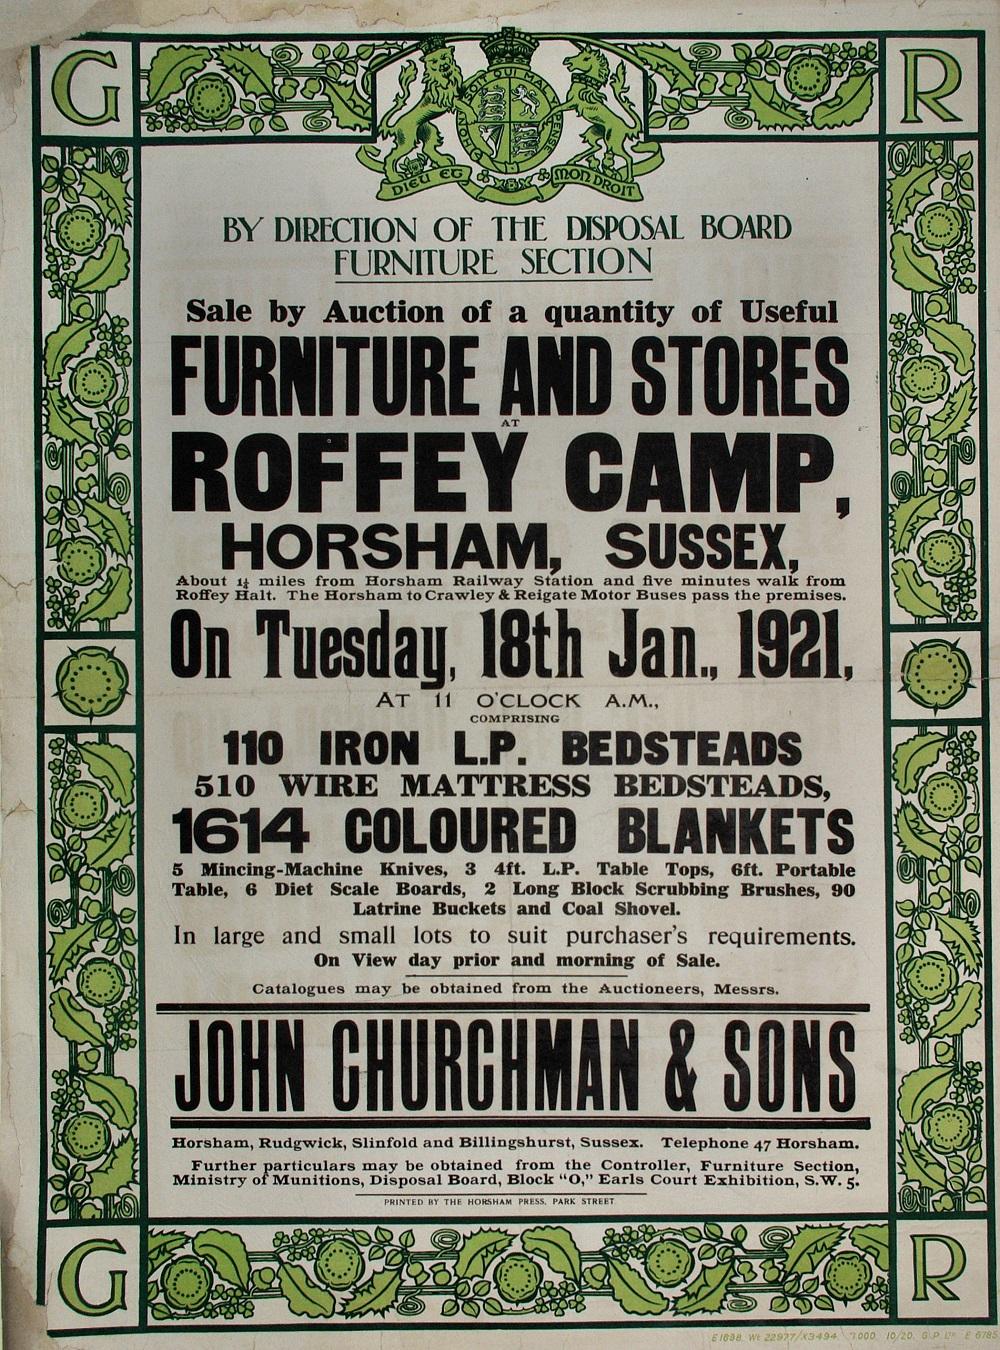 Roffey furniture sale